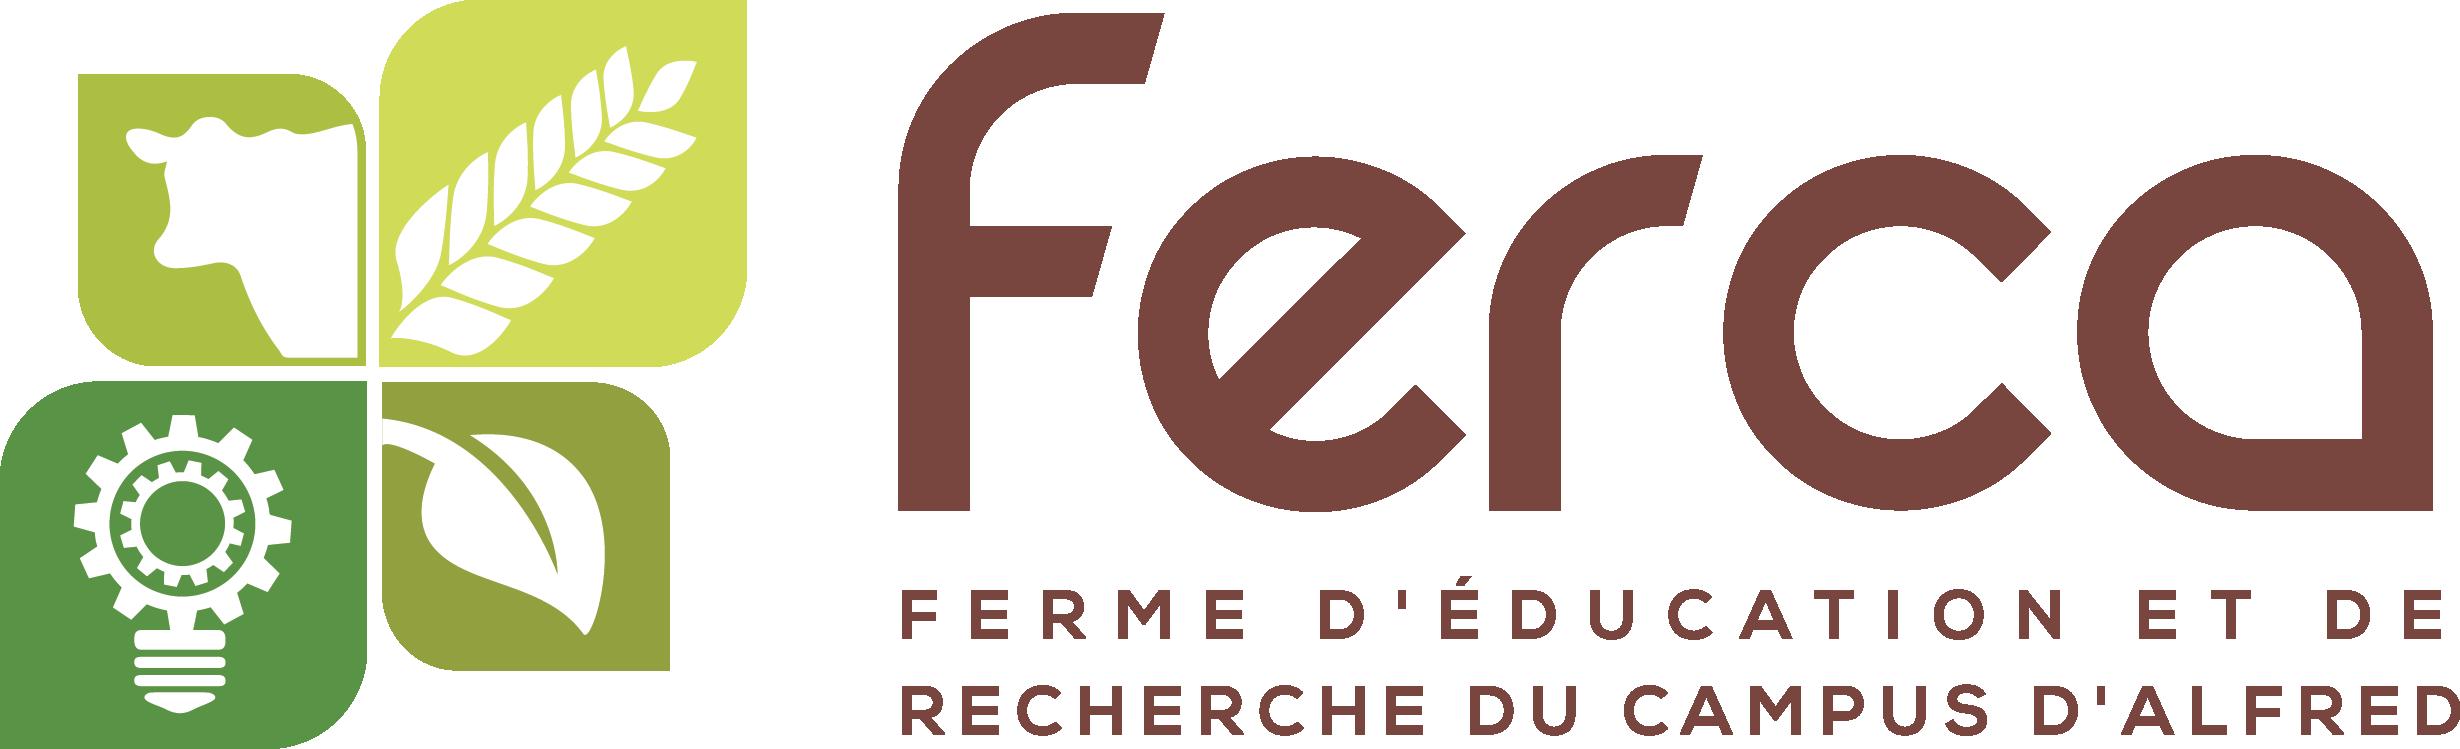 ferca-logo_couleurs